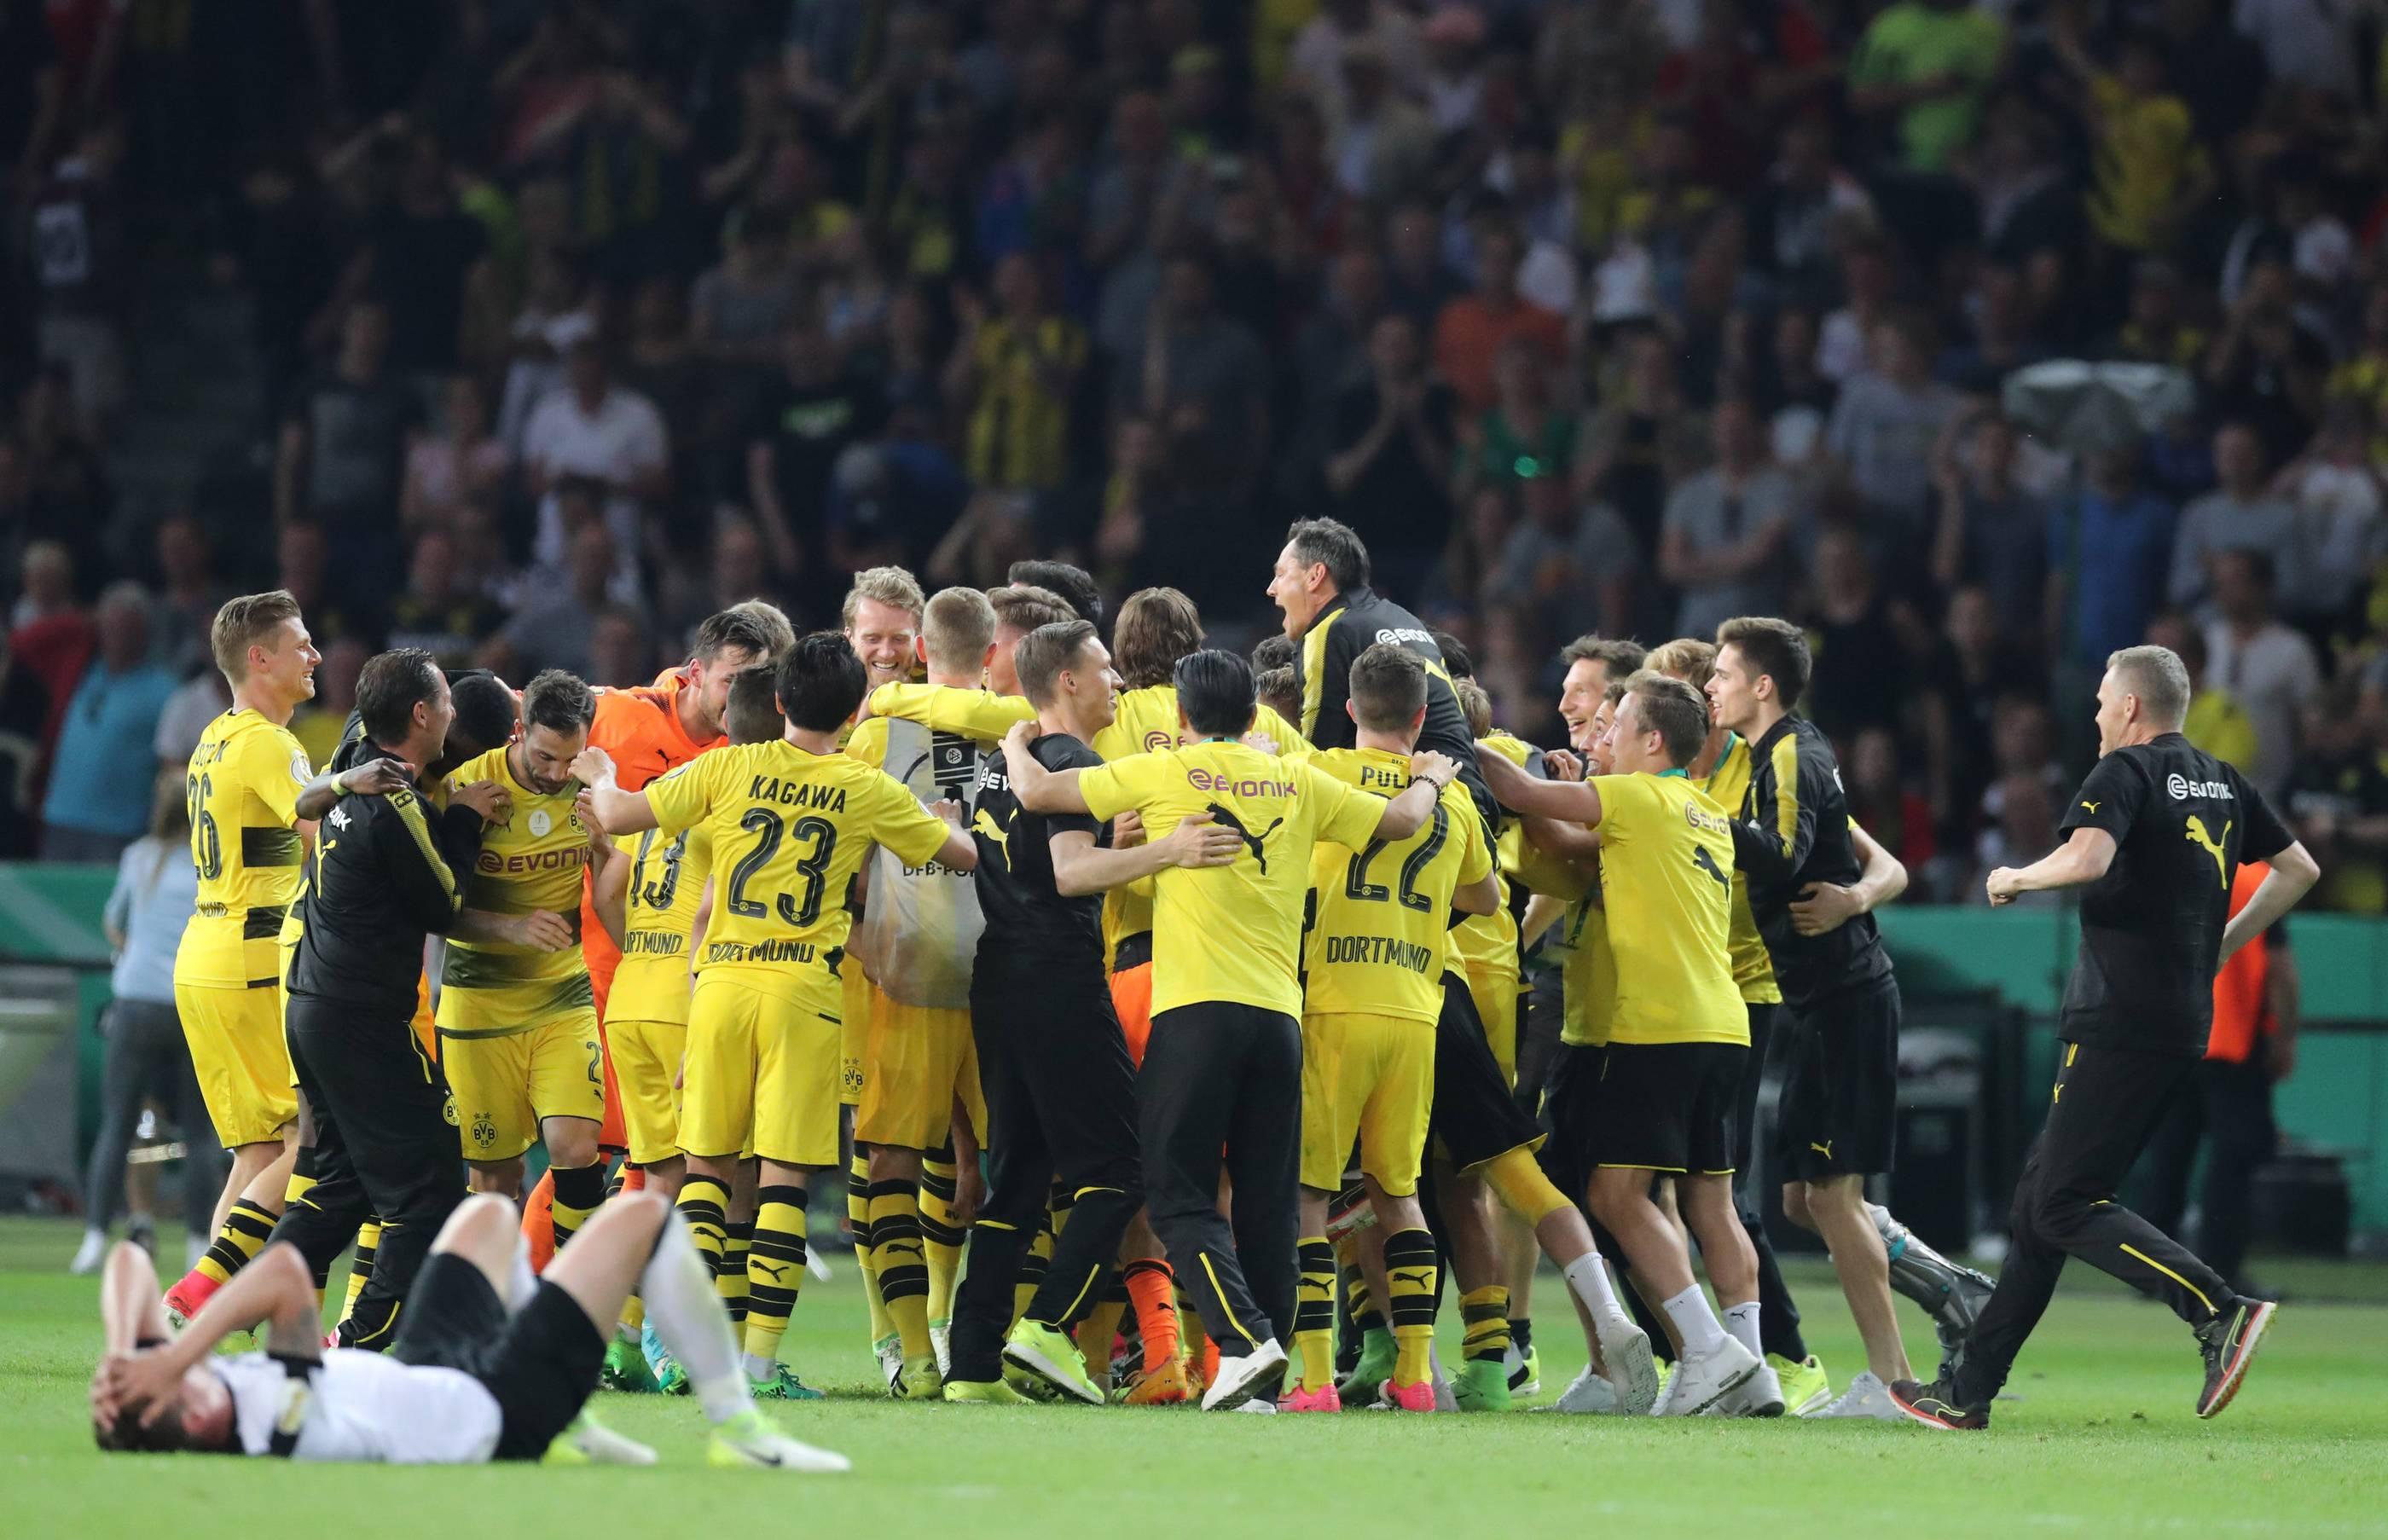 DFB-Pokal-Finale Borussia Dortmund - Eintracht Frankfurt